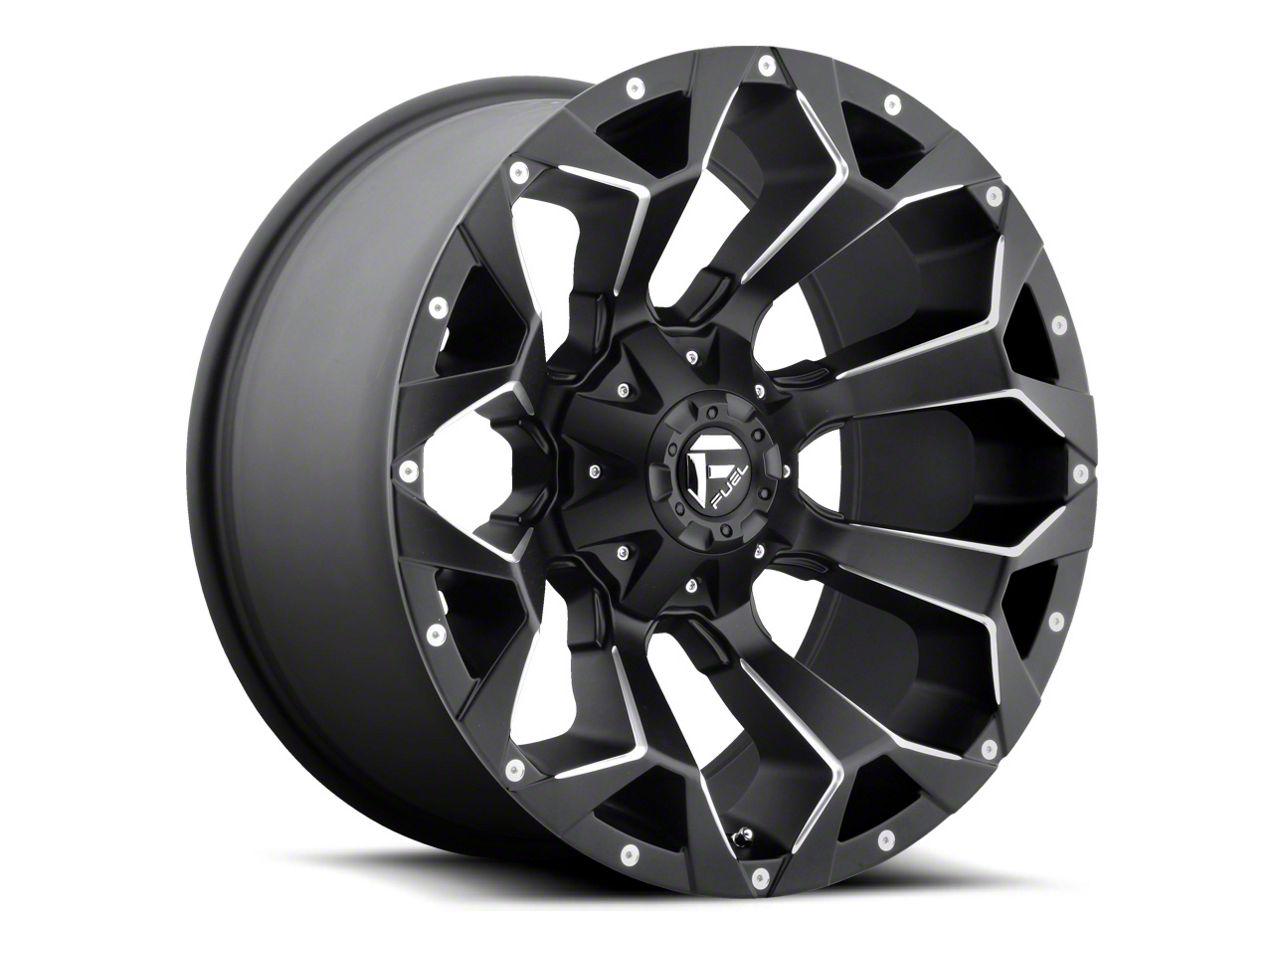 Fuel Wheels Assault Black Milled 6-Lug Wheel - 22x10 (07-18 Sierra 1500)